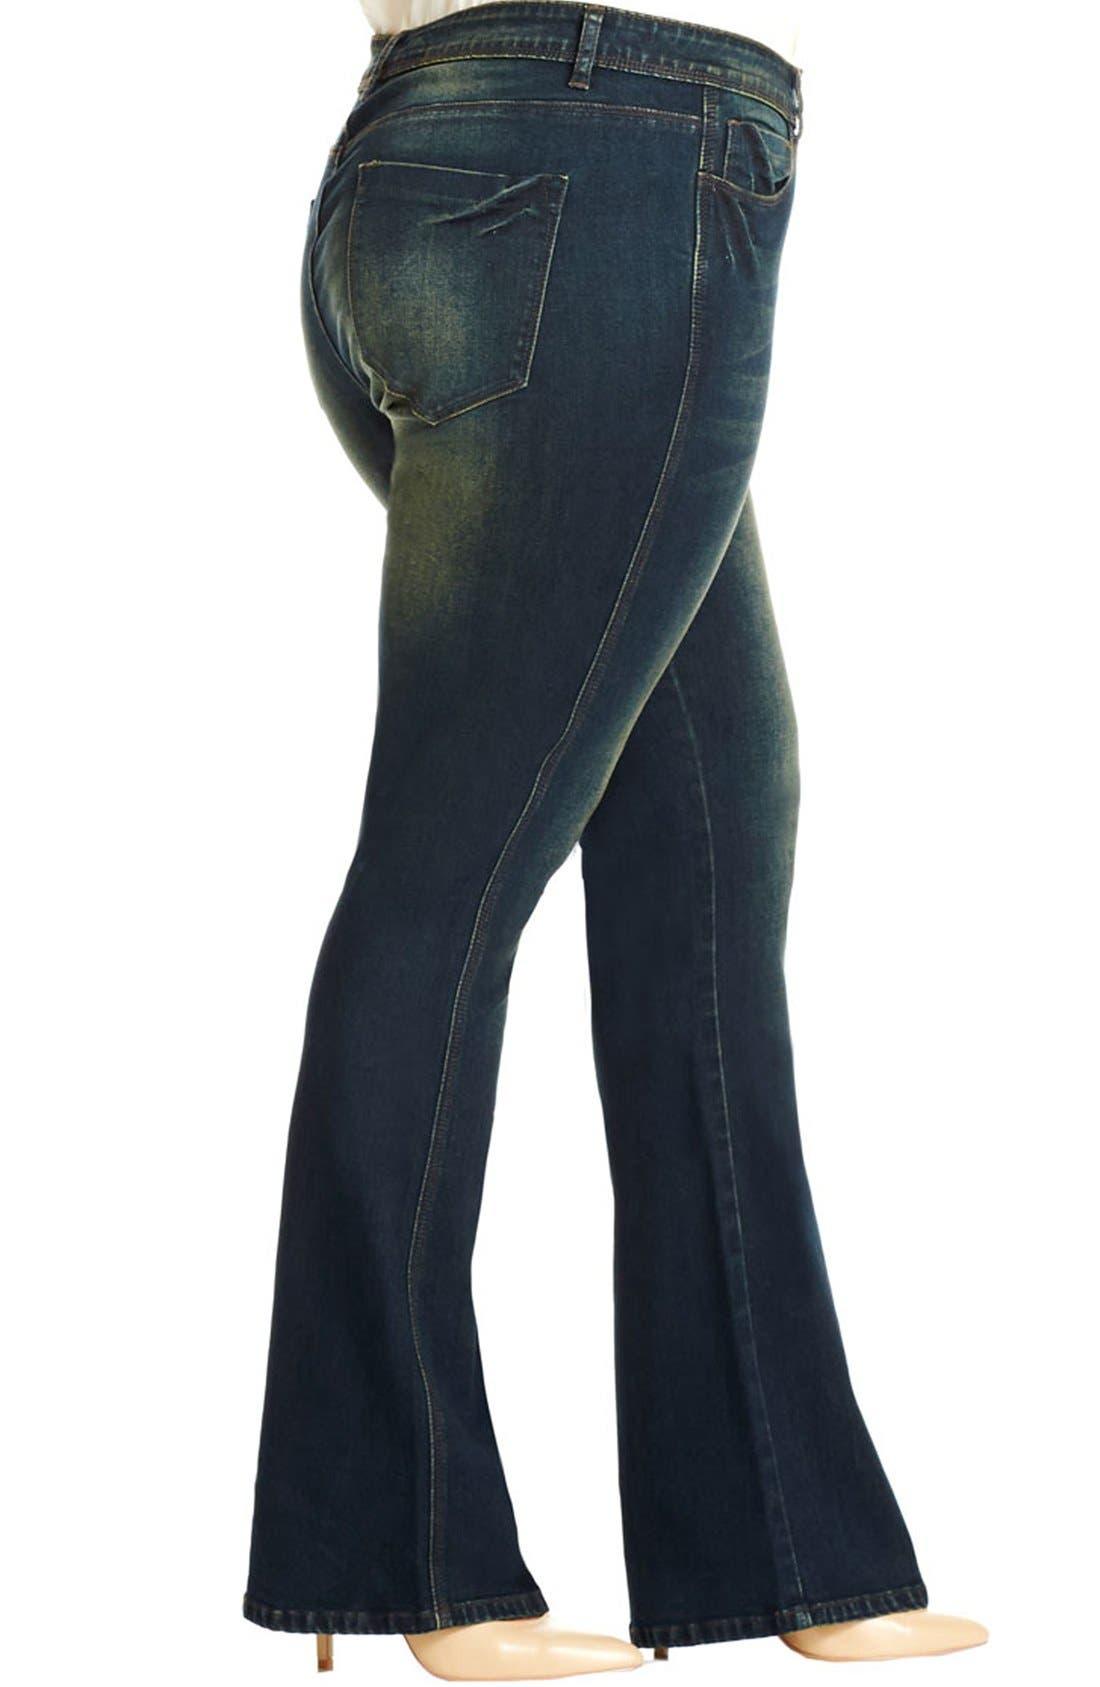 Alternate Image 3  - City Chic 'Dirty Wash' Stretch Bootcut Jeans (Dark Denim) (Plus Size)